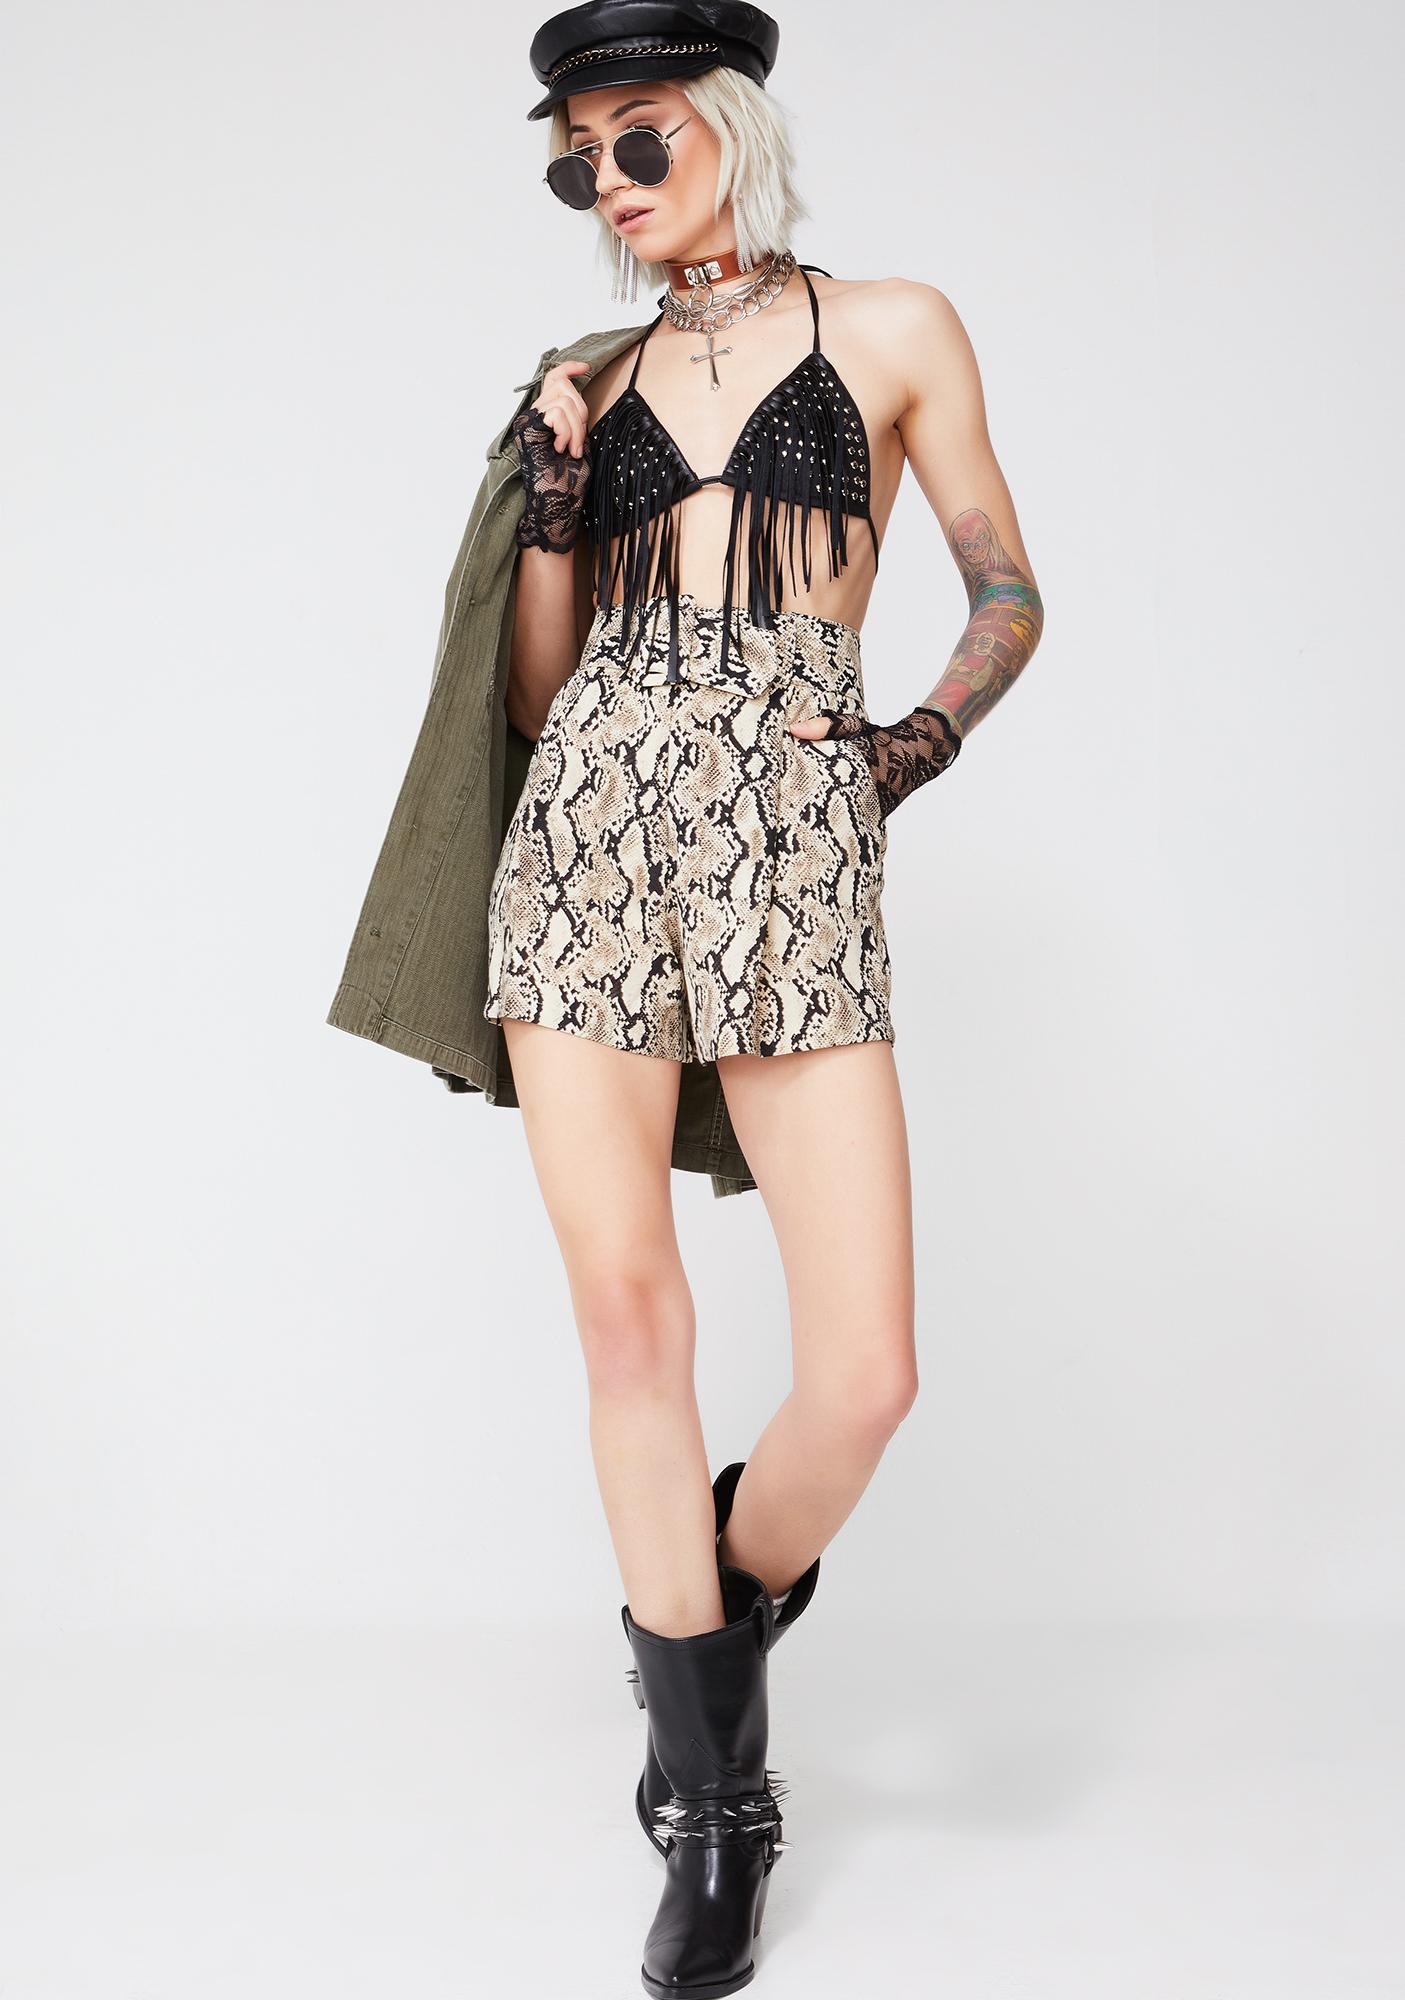 Toxic Tripster Snakeskin Shorts